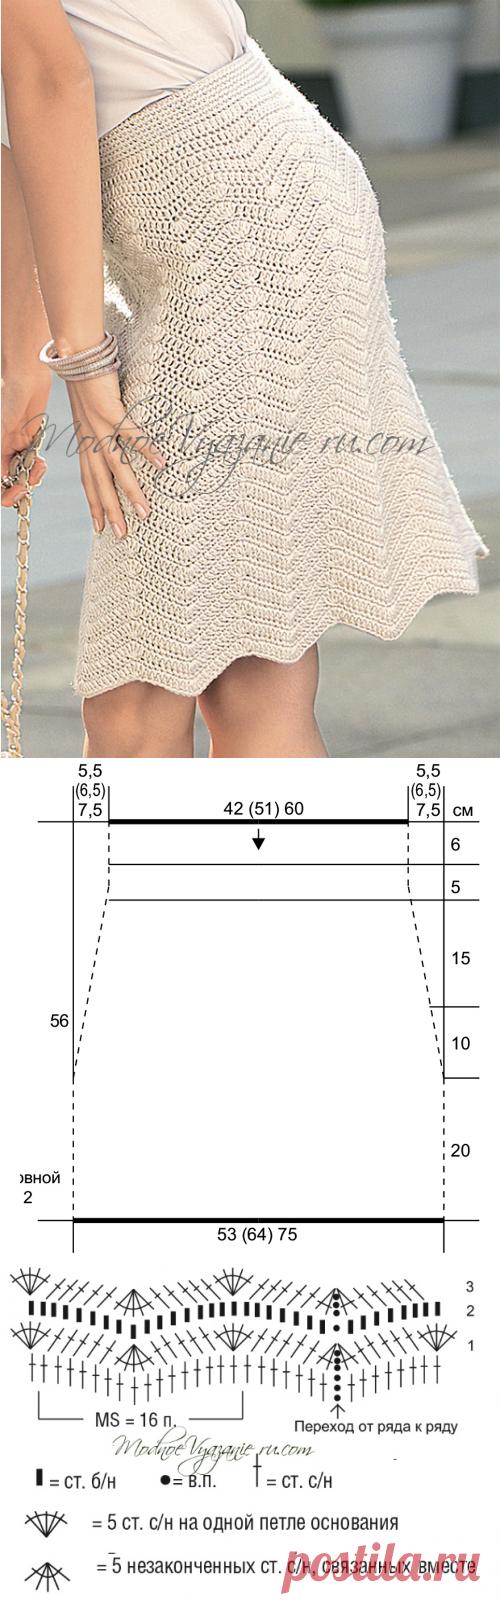 Юбка с фигурным краем узором зигзаг - Crochet - Modnoe Vyazanie